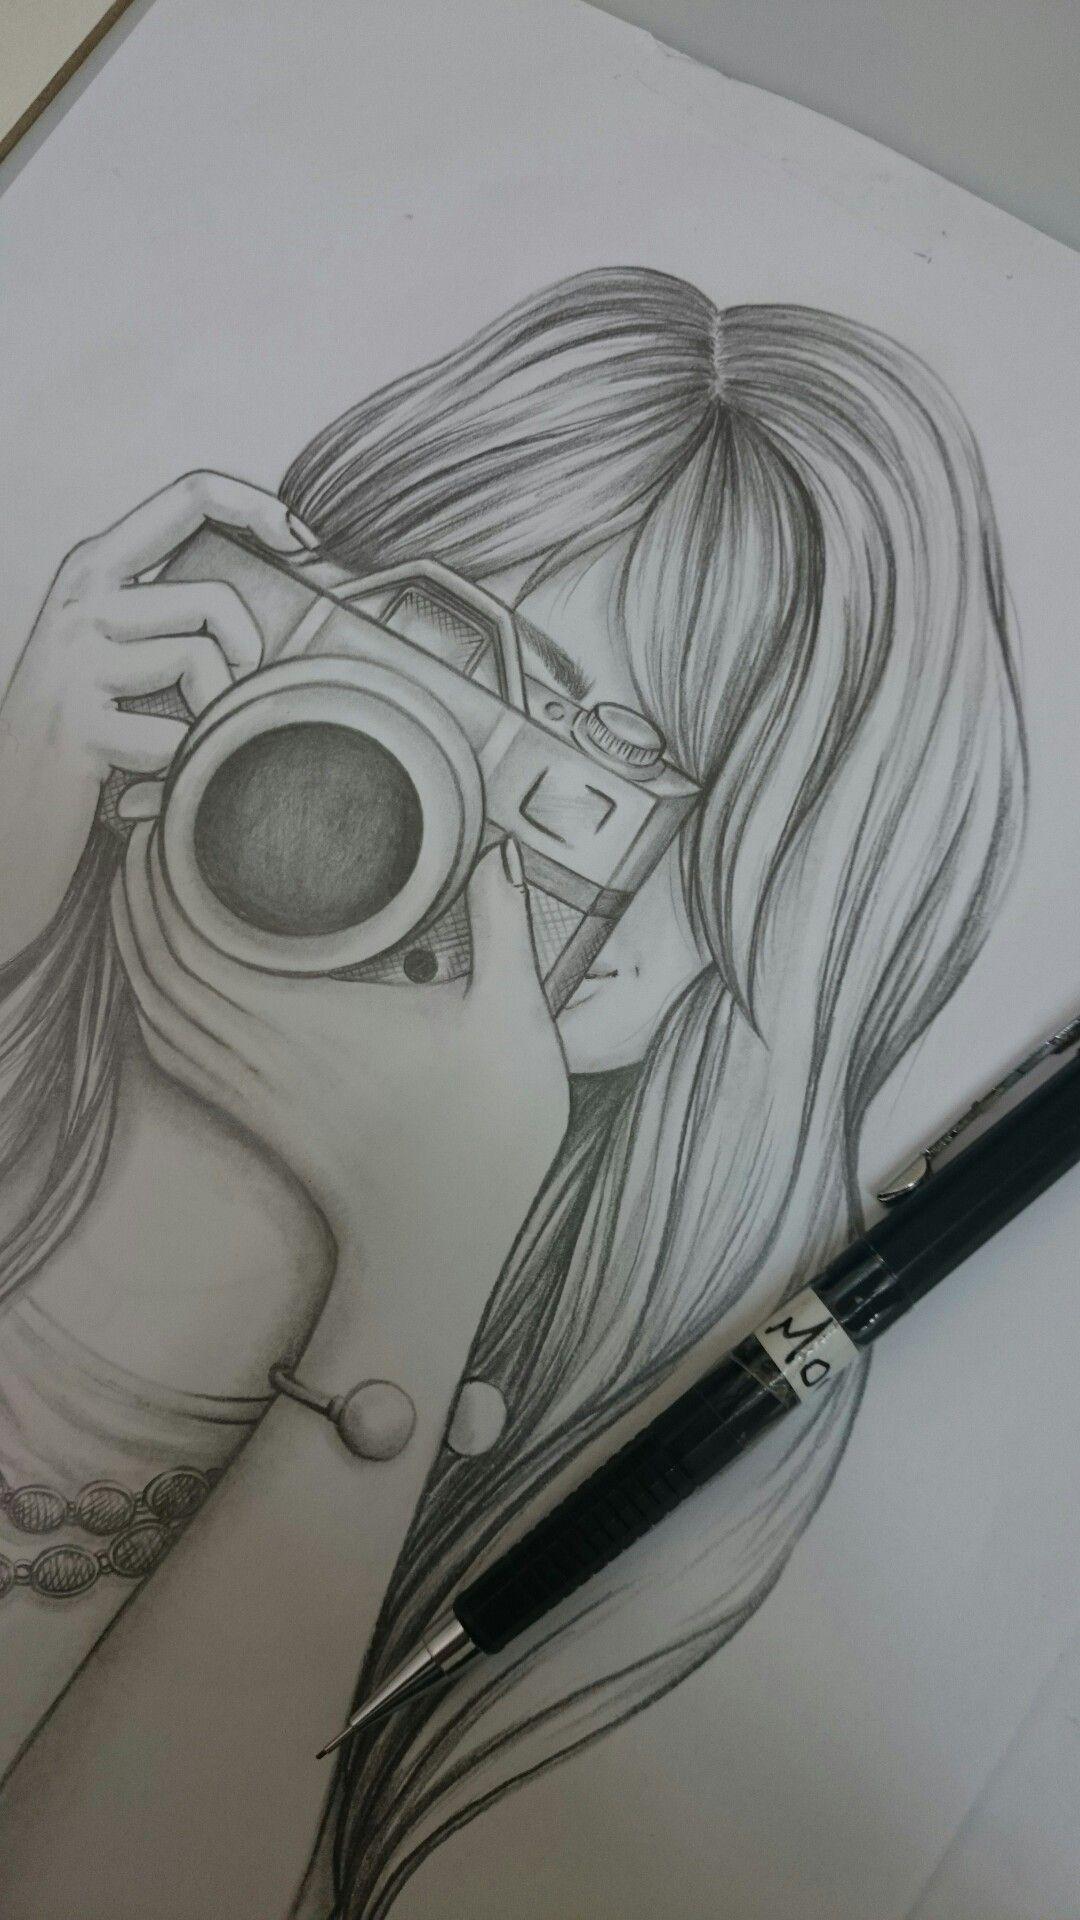 Pin By On Art Ideas In 2020 Disney Art Drawings Art Drawings Sketches Creative Girly Drawings